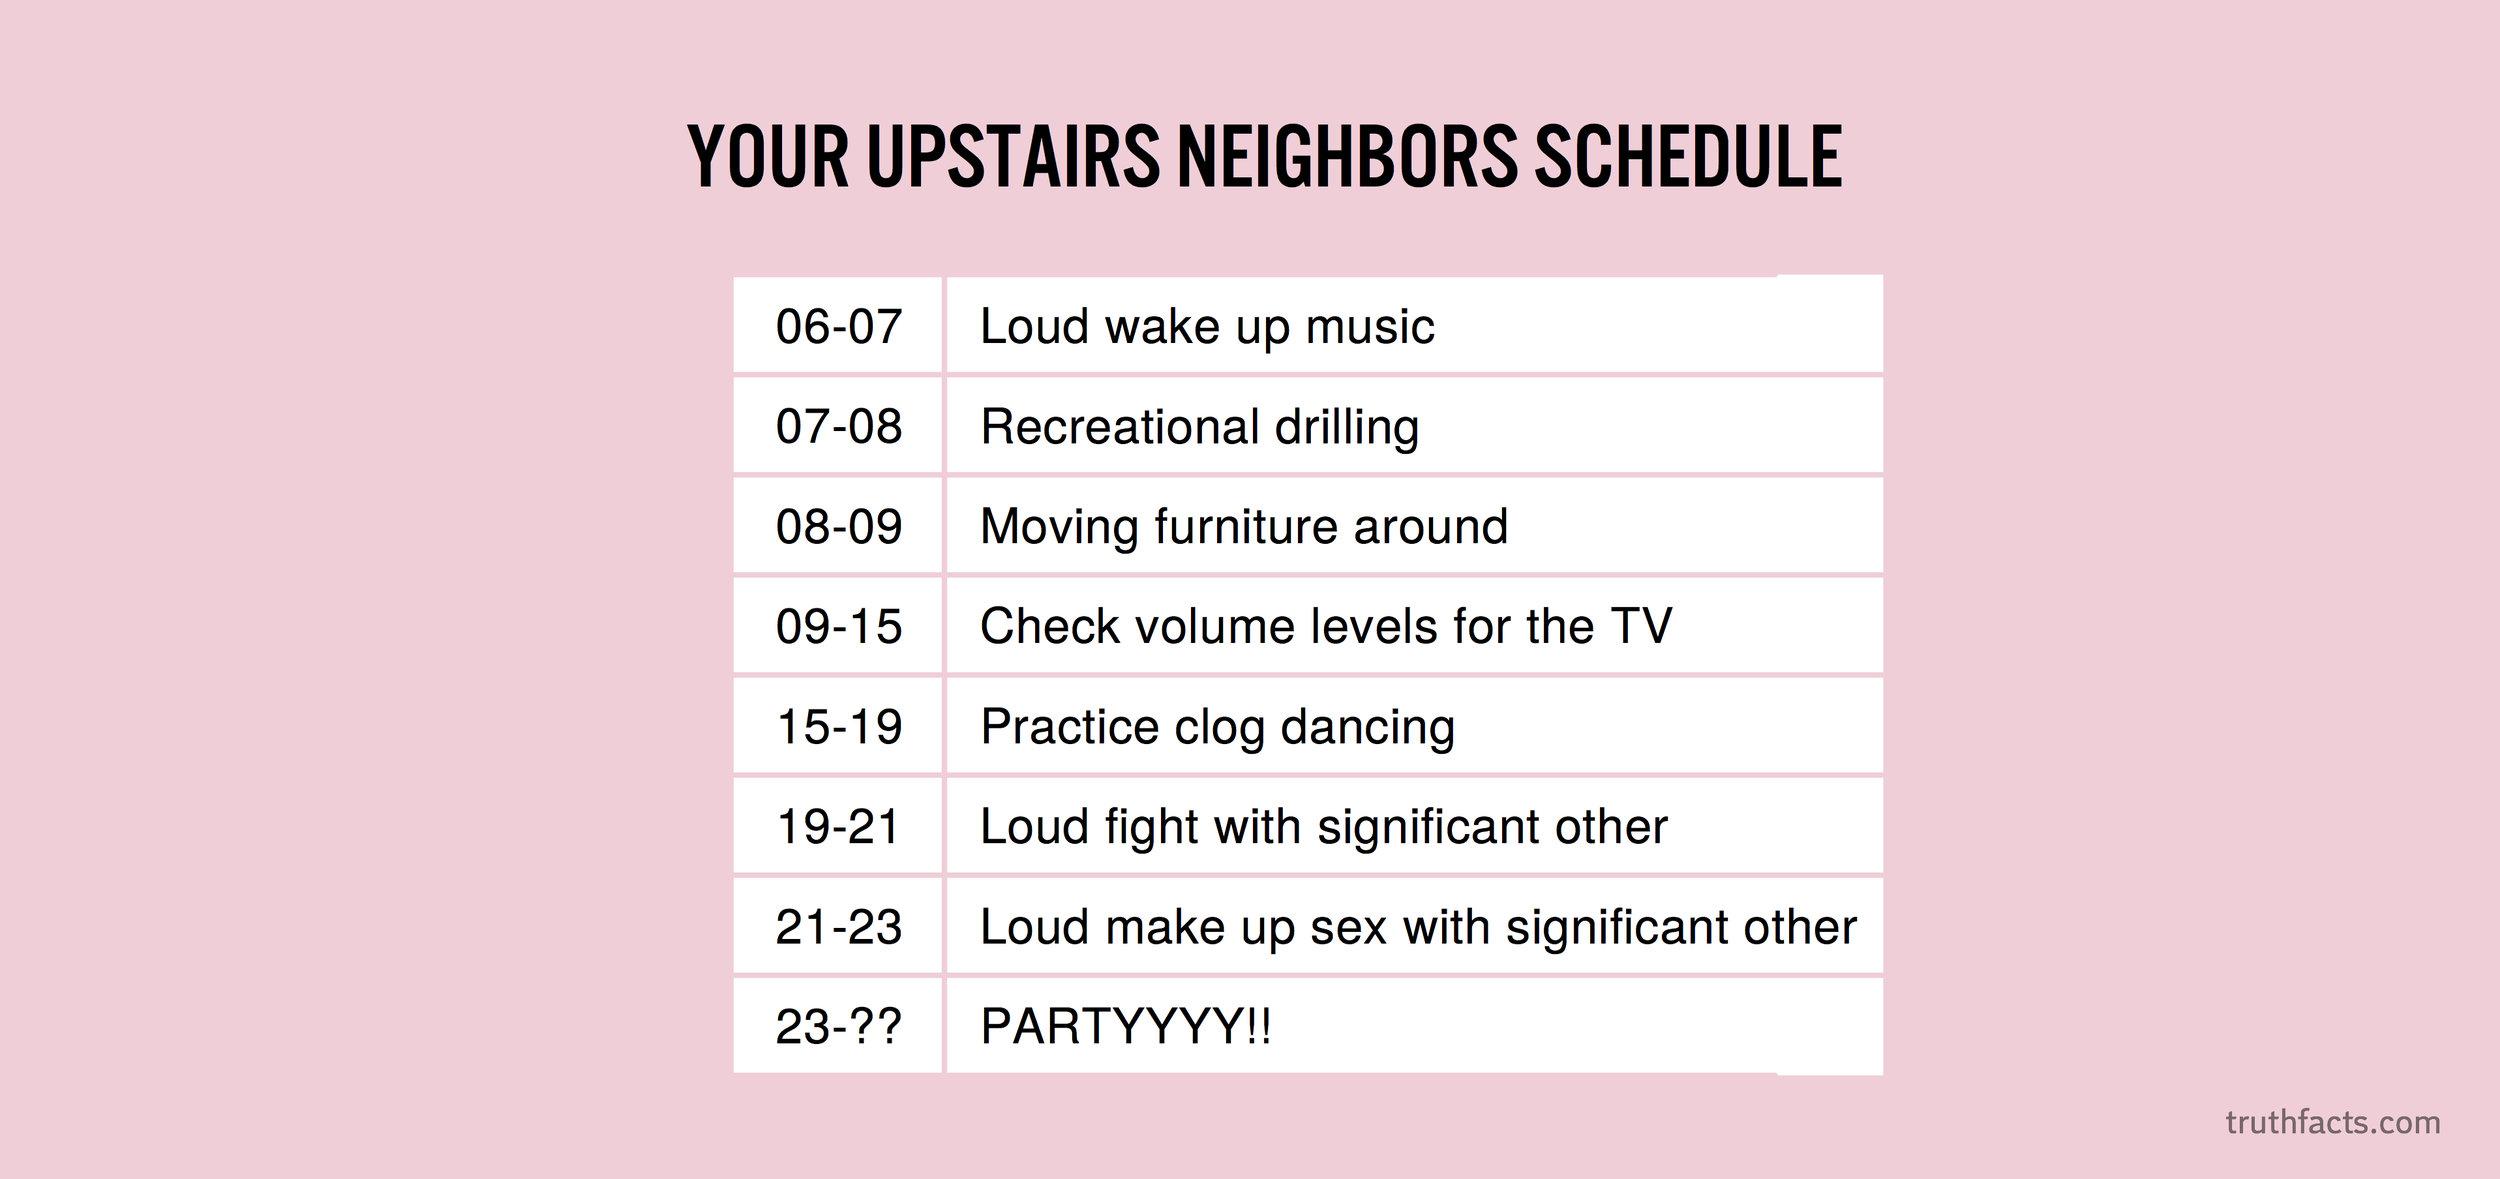 Your upstairs neighbors schedule